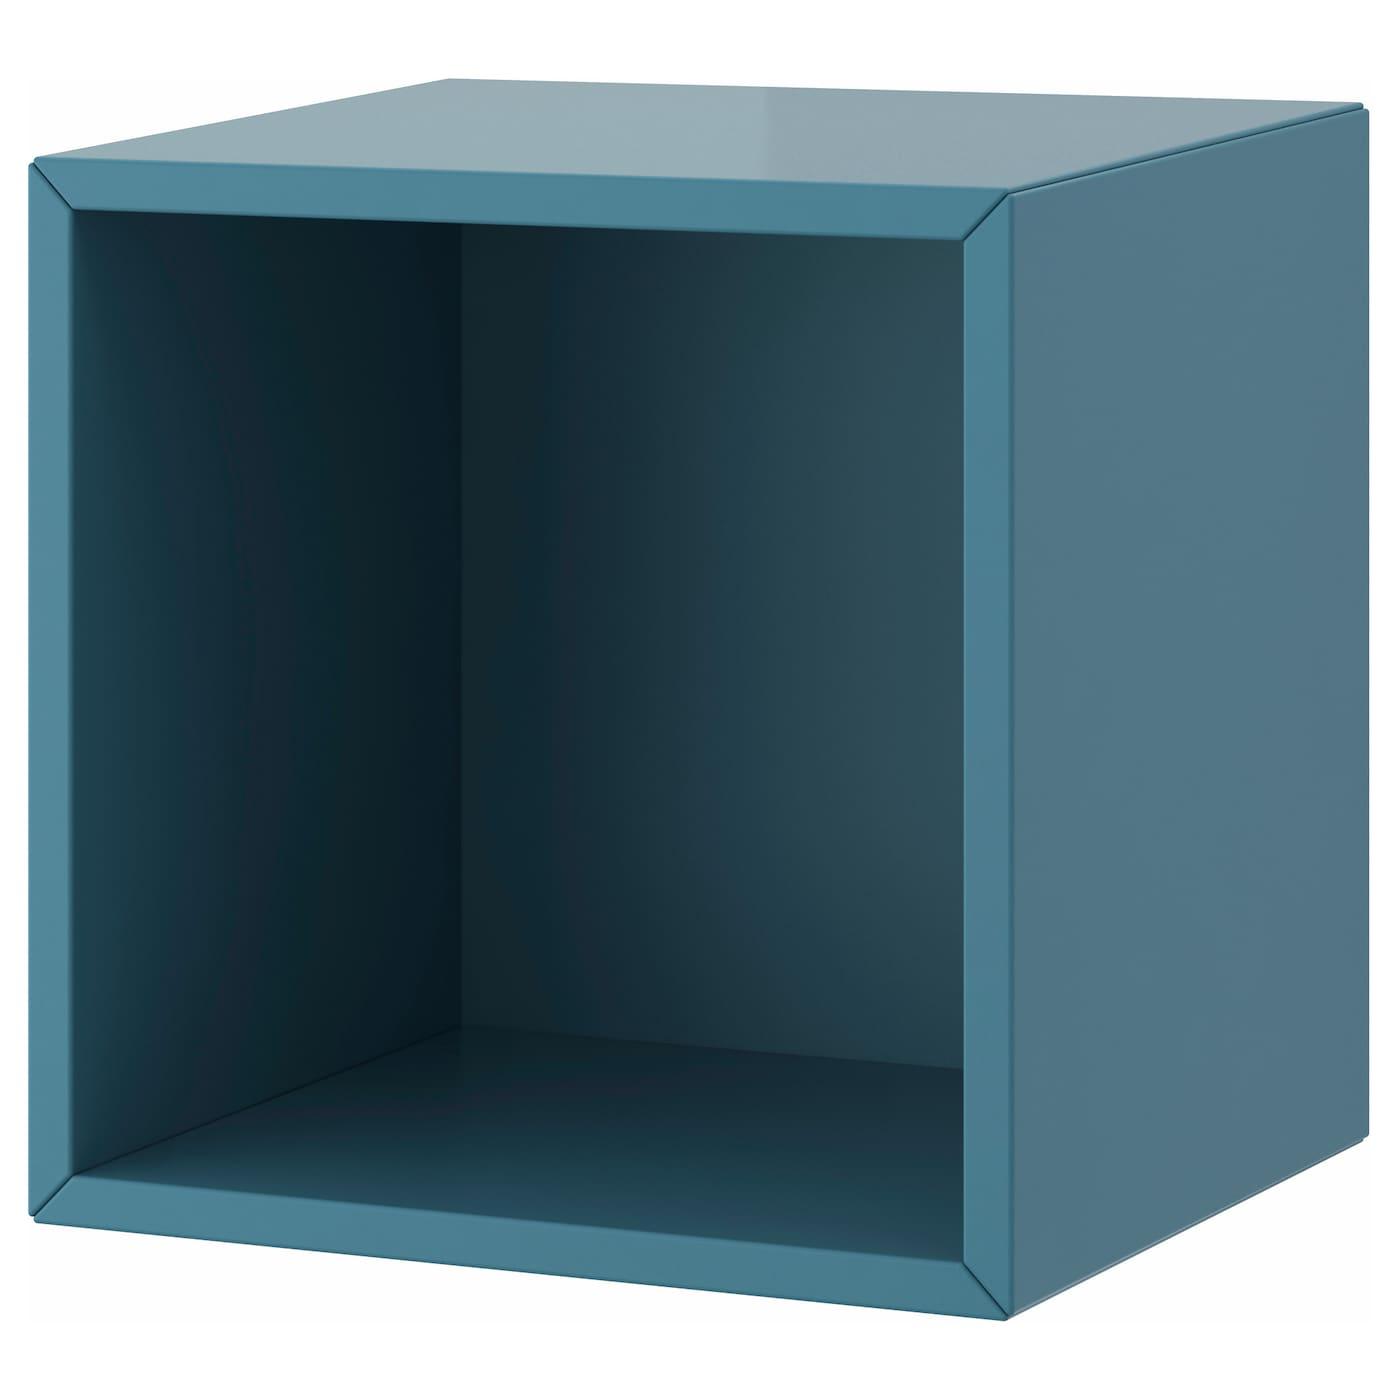 Valje wall cabinet blue turquoise 35x35 cm ikea - Cubes de rangement ikea ...